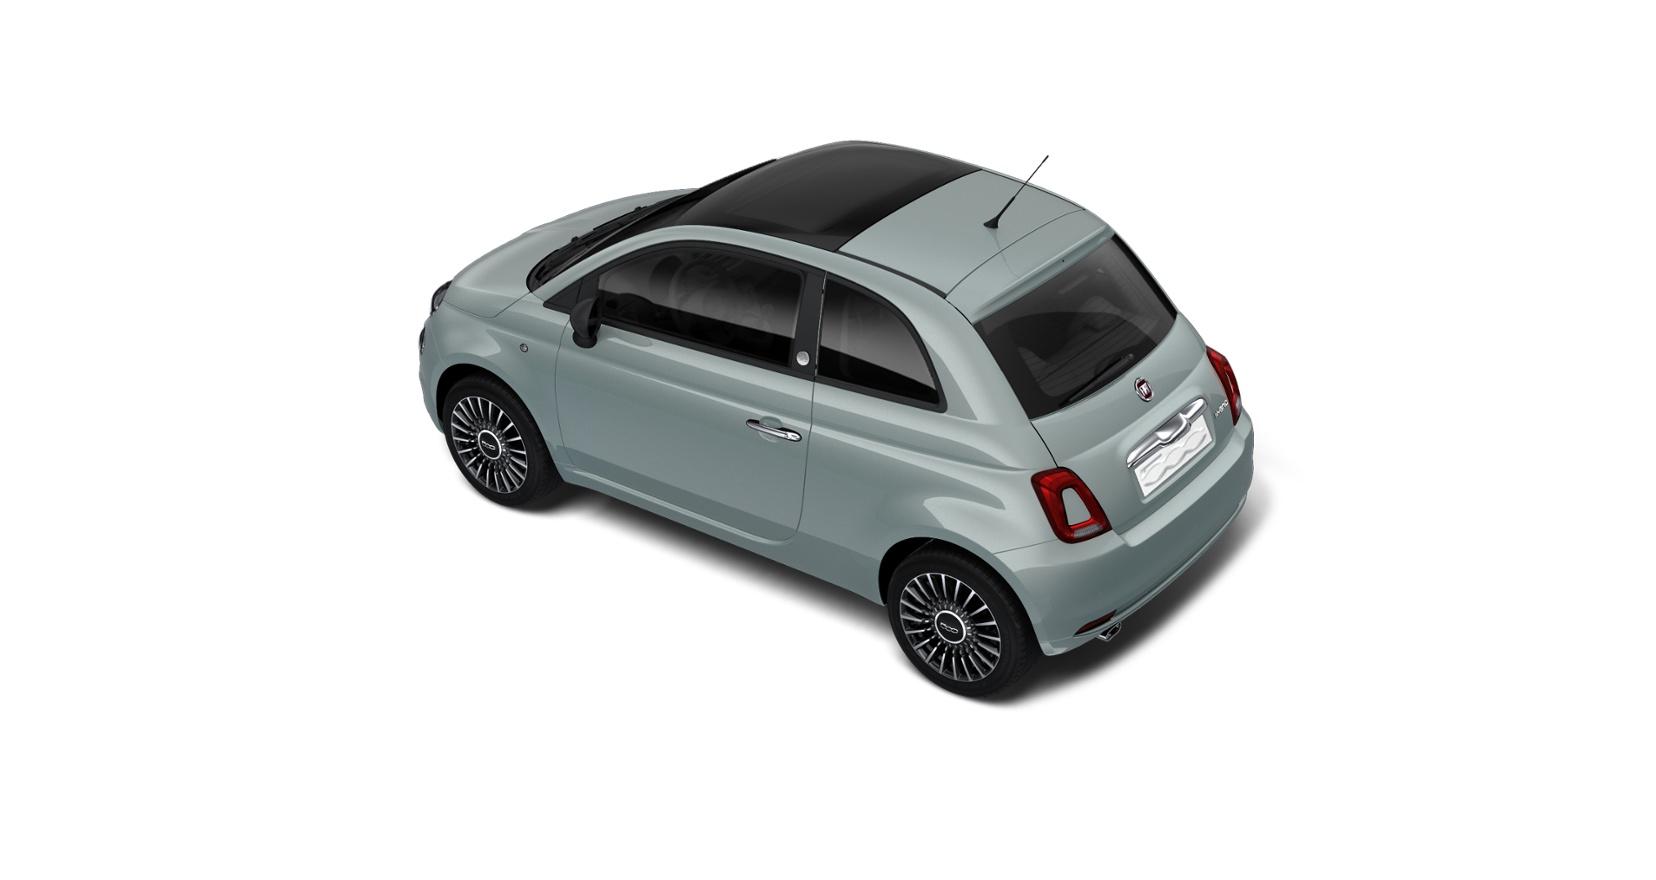 Fiat 500 hybrid launch edition - schuin bovenaanzicht